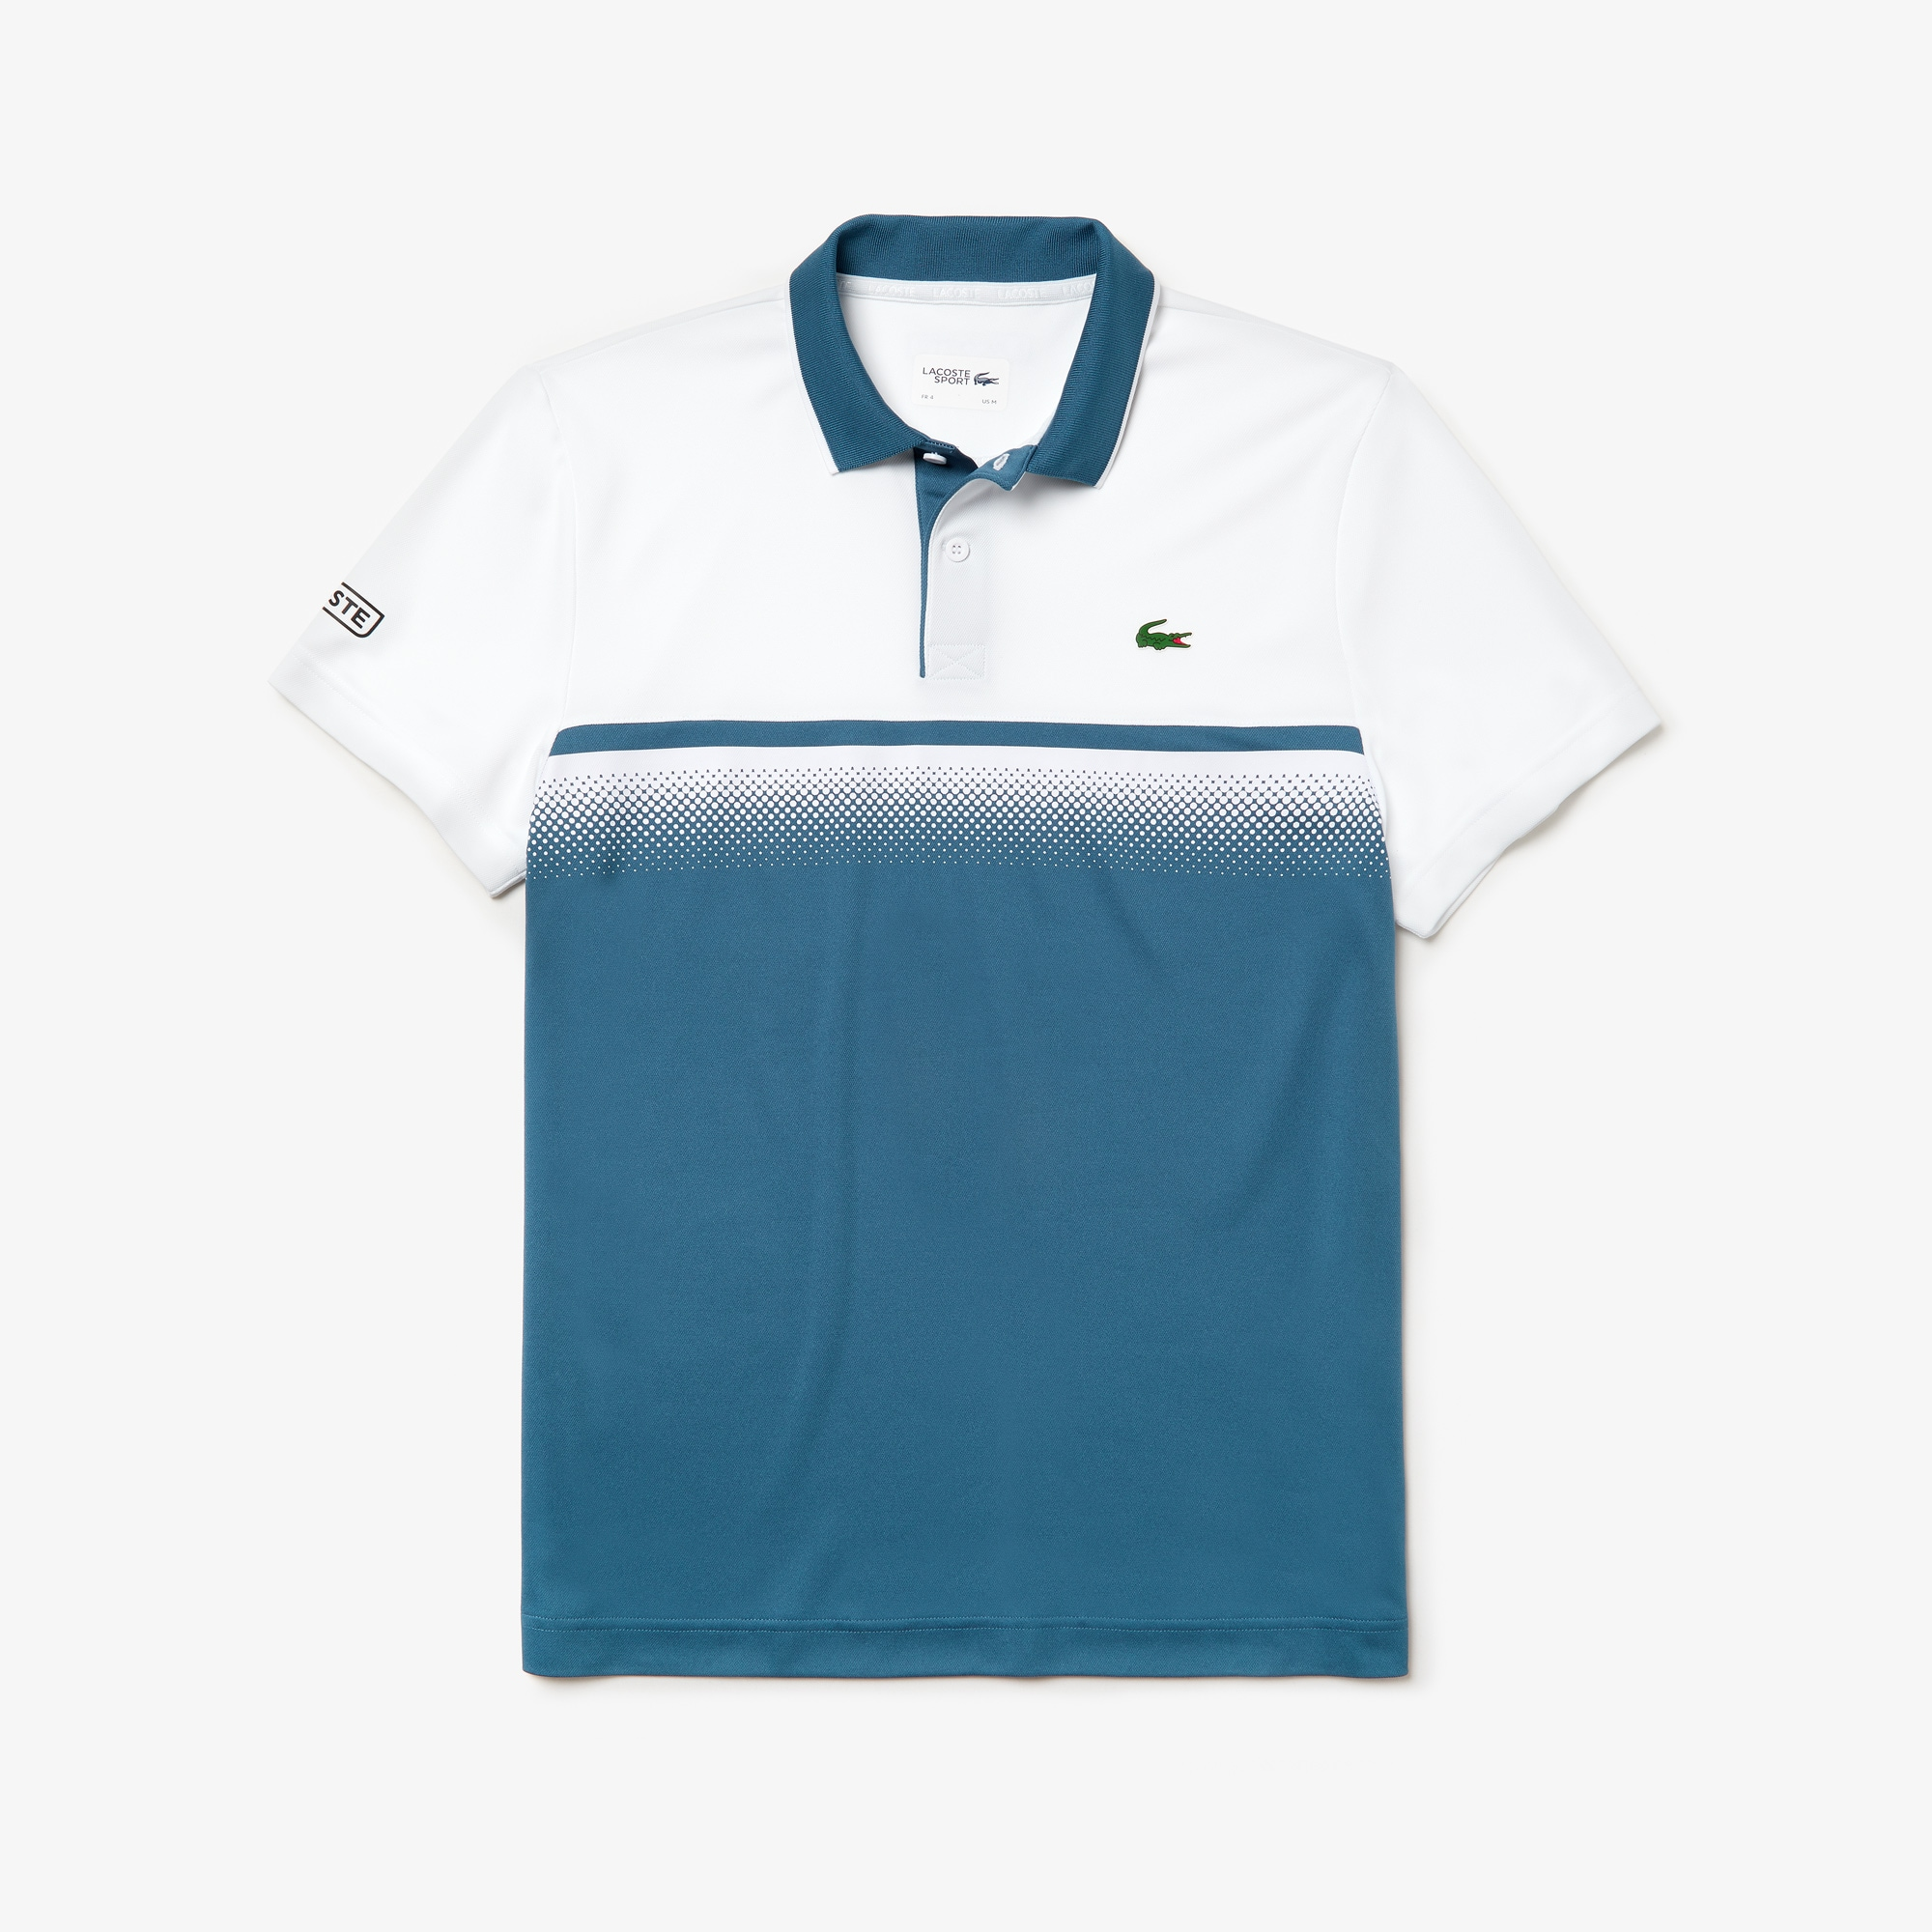 feb3a956138 Men s Polo Shirts